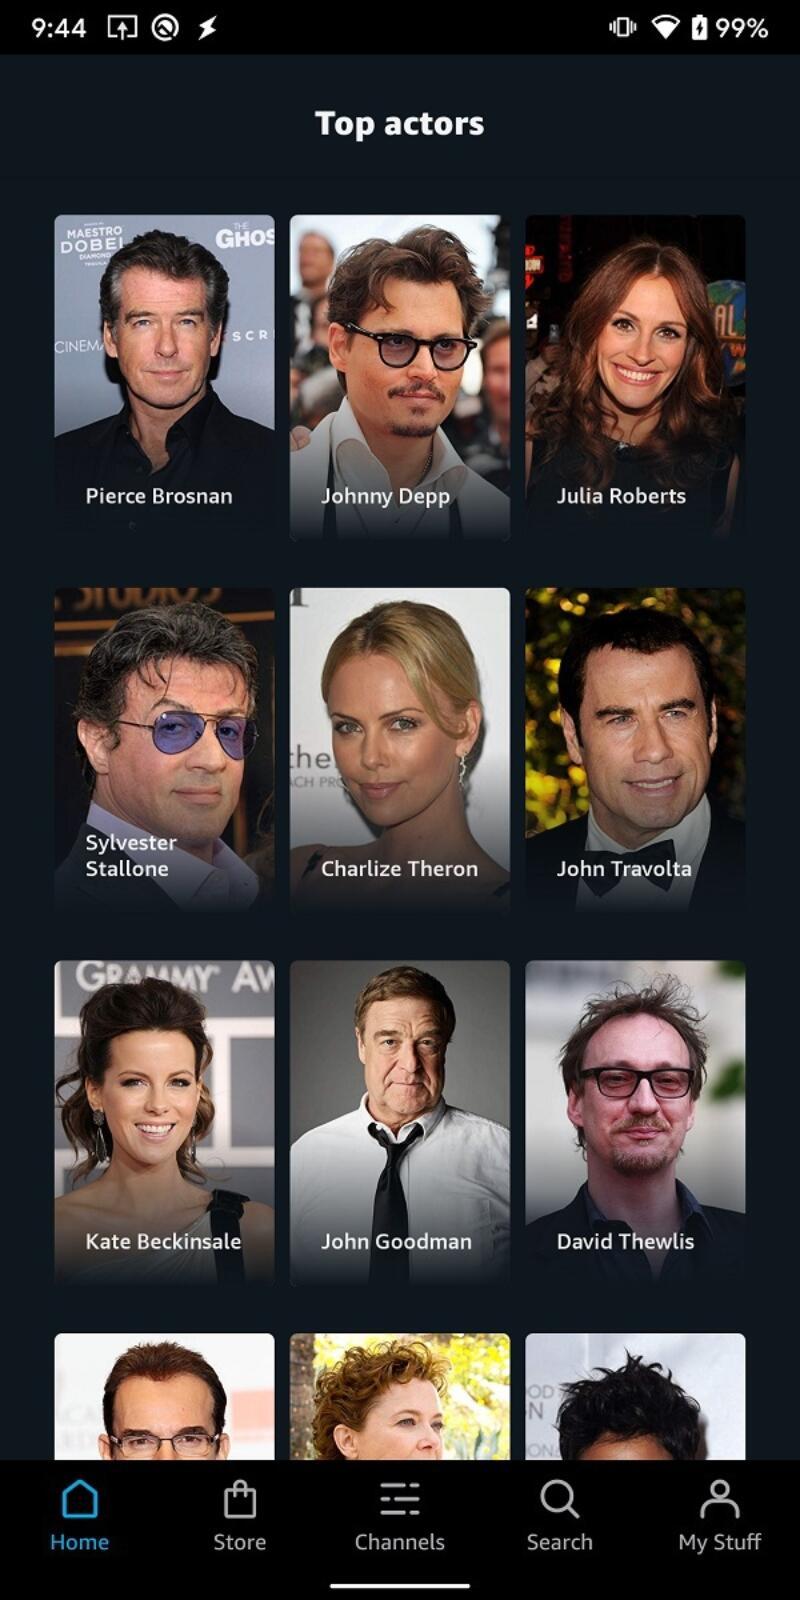 Amazon Prime Video Top Actors